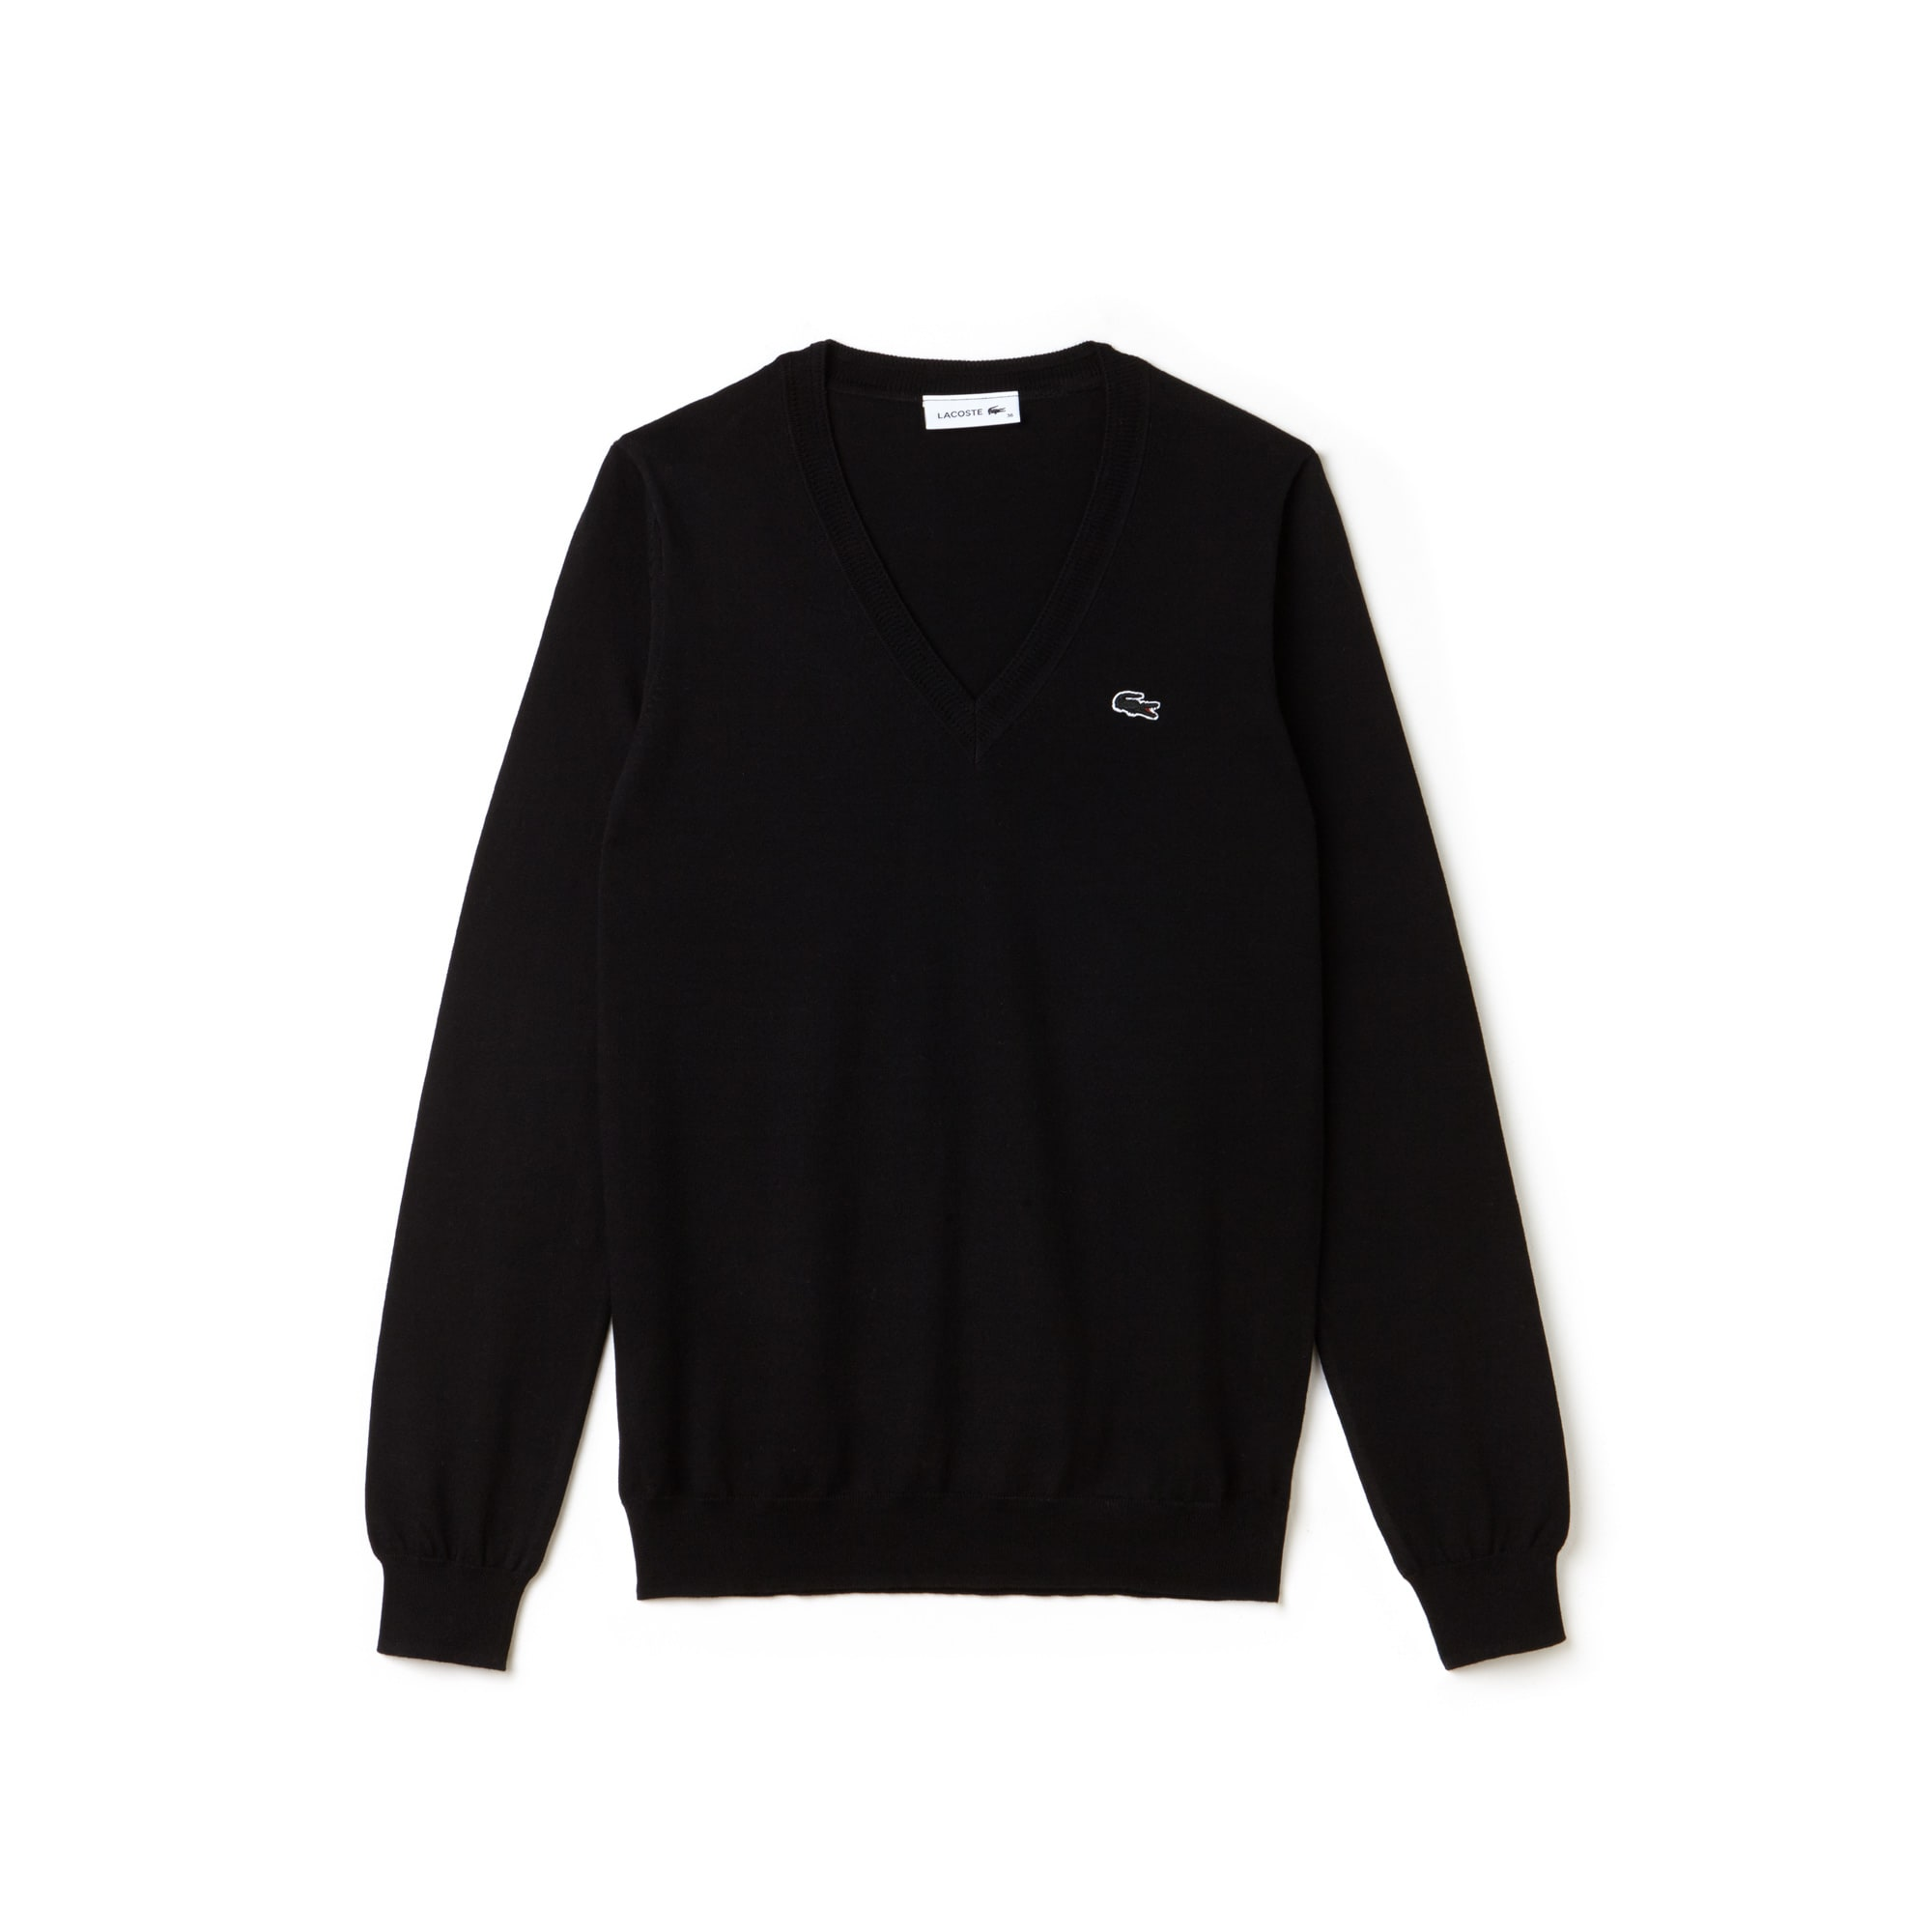 Black V-Neck